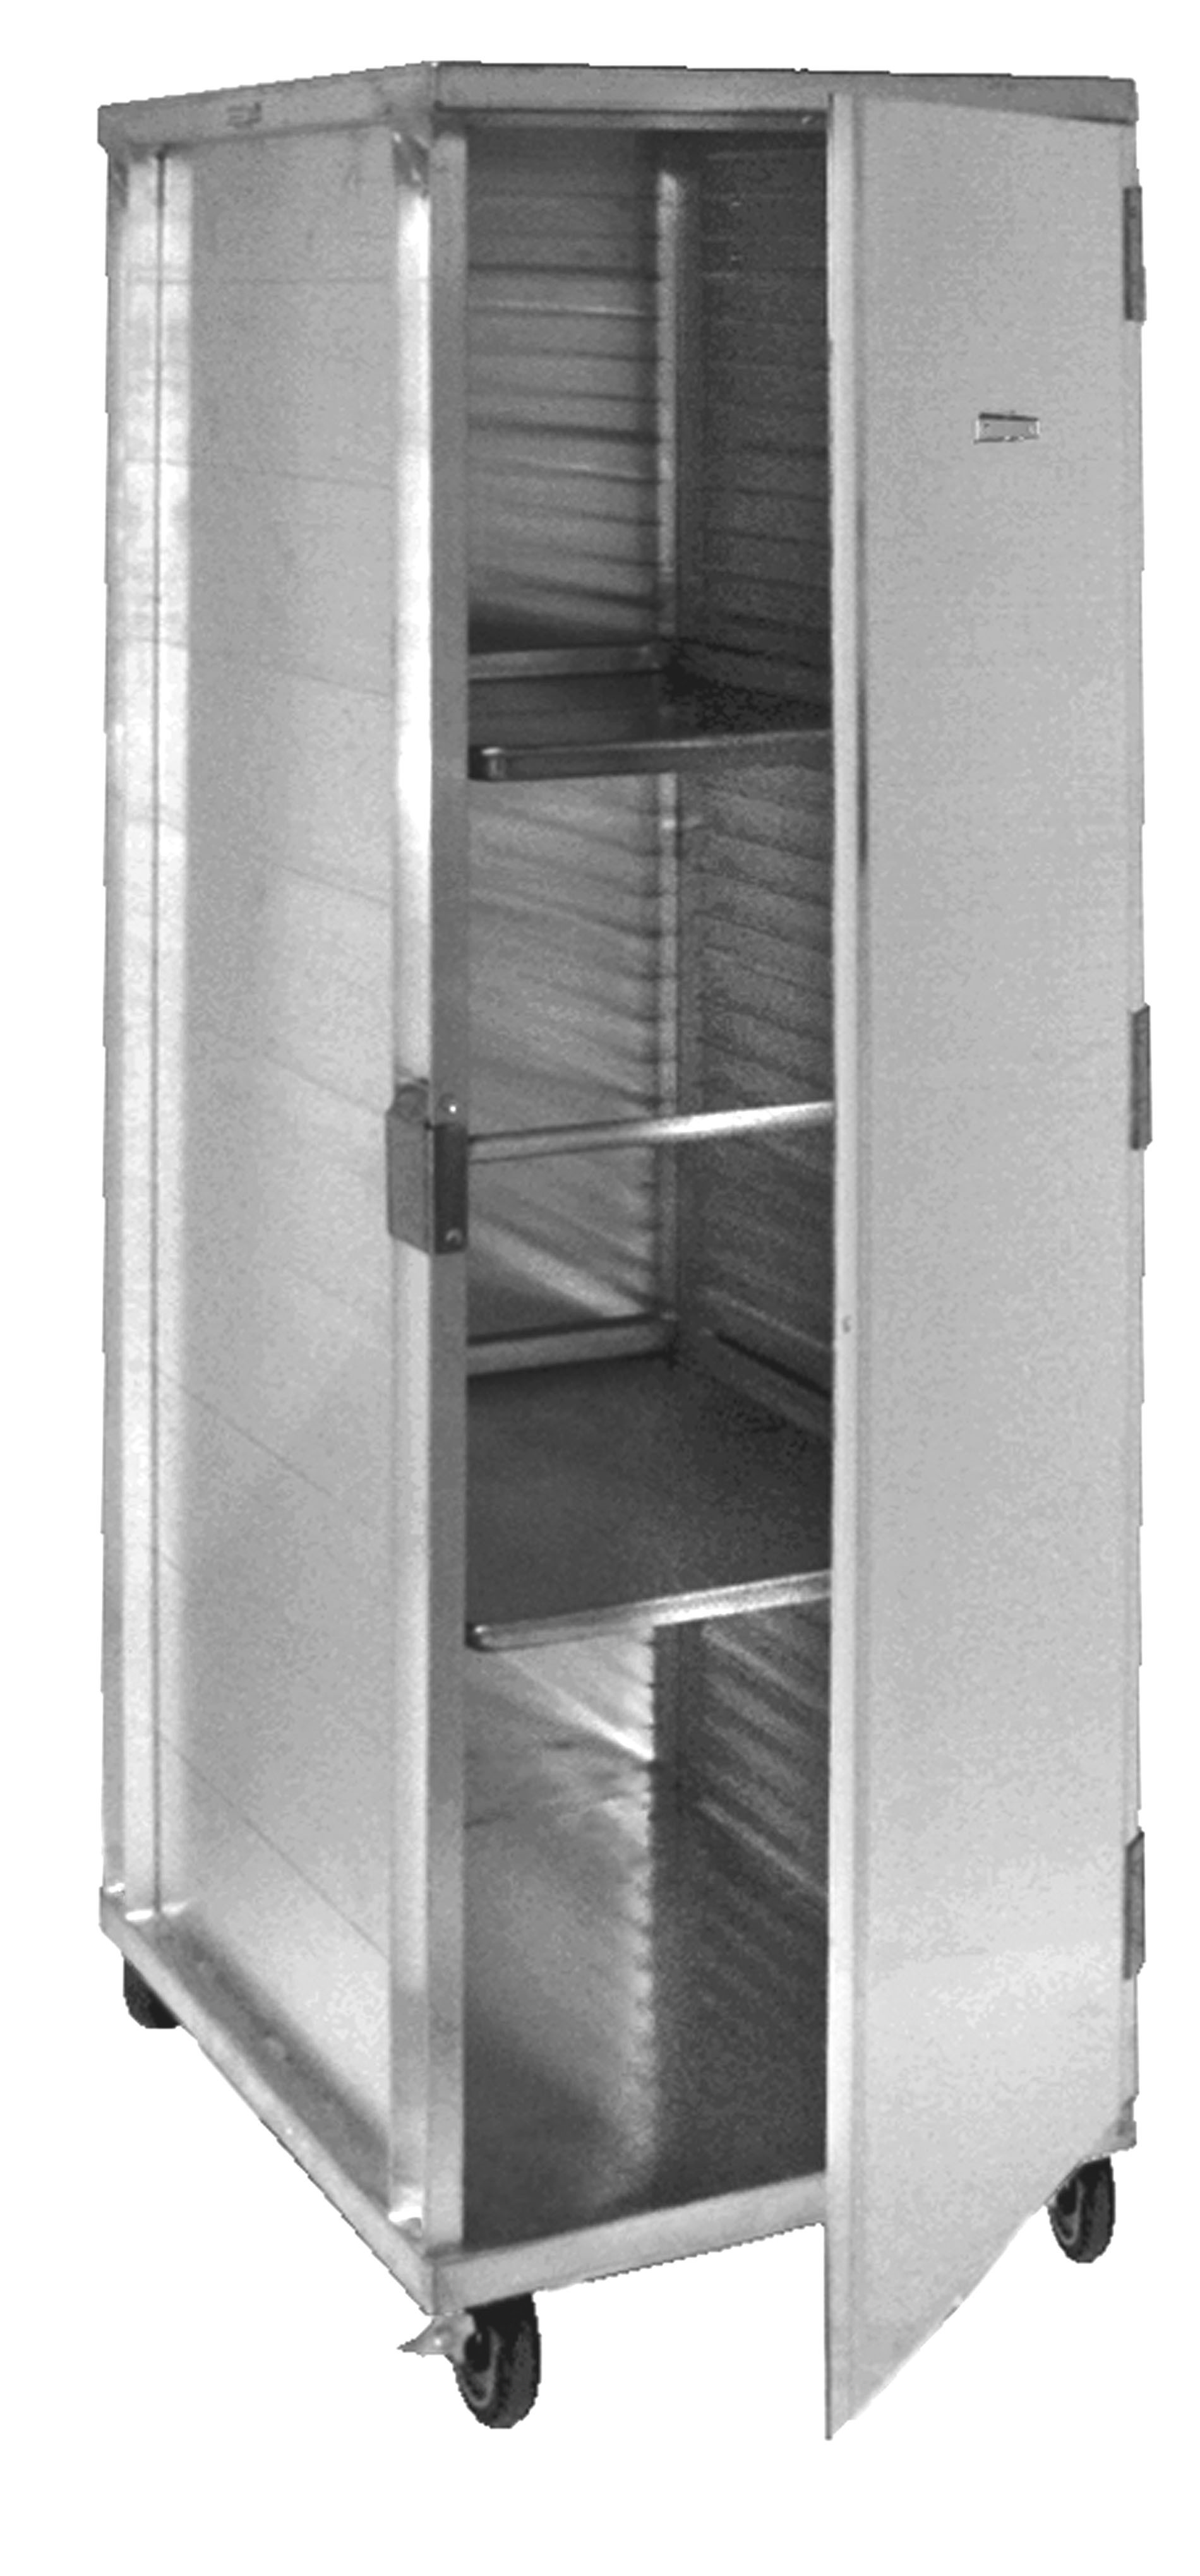 pot of rack kitchen organizer wall holder pan shelf mount hanger storage cookware